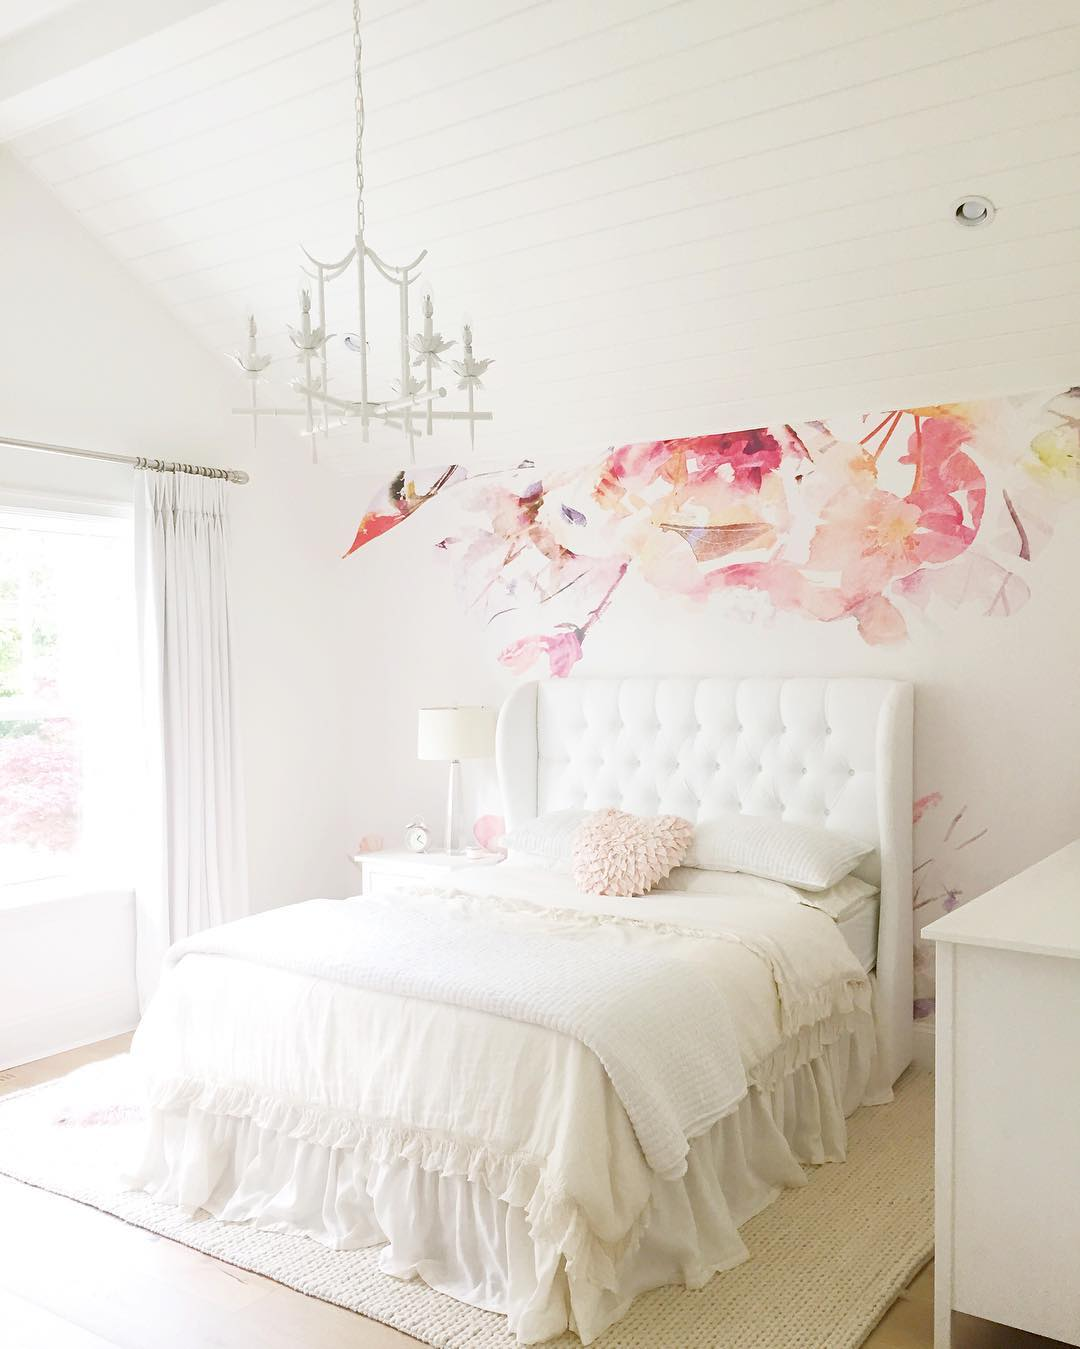 jshomedesign - daugters bedroom